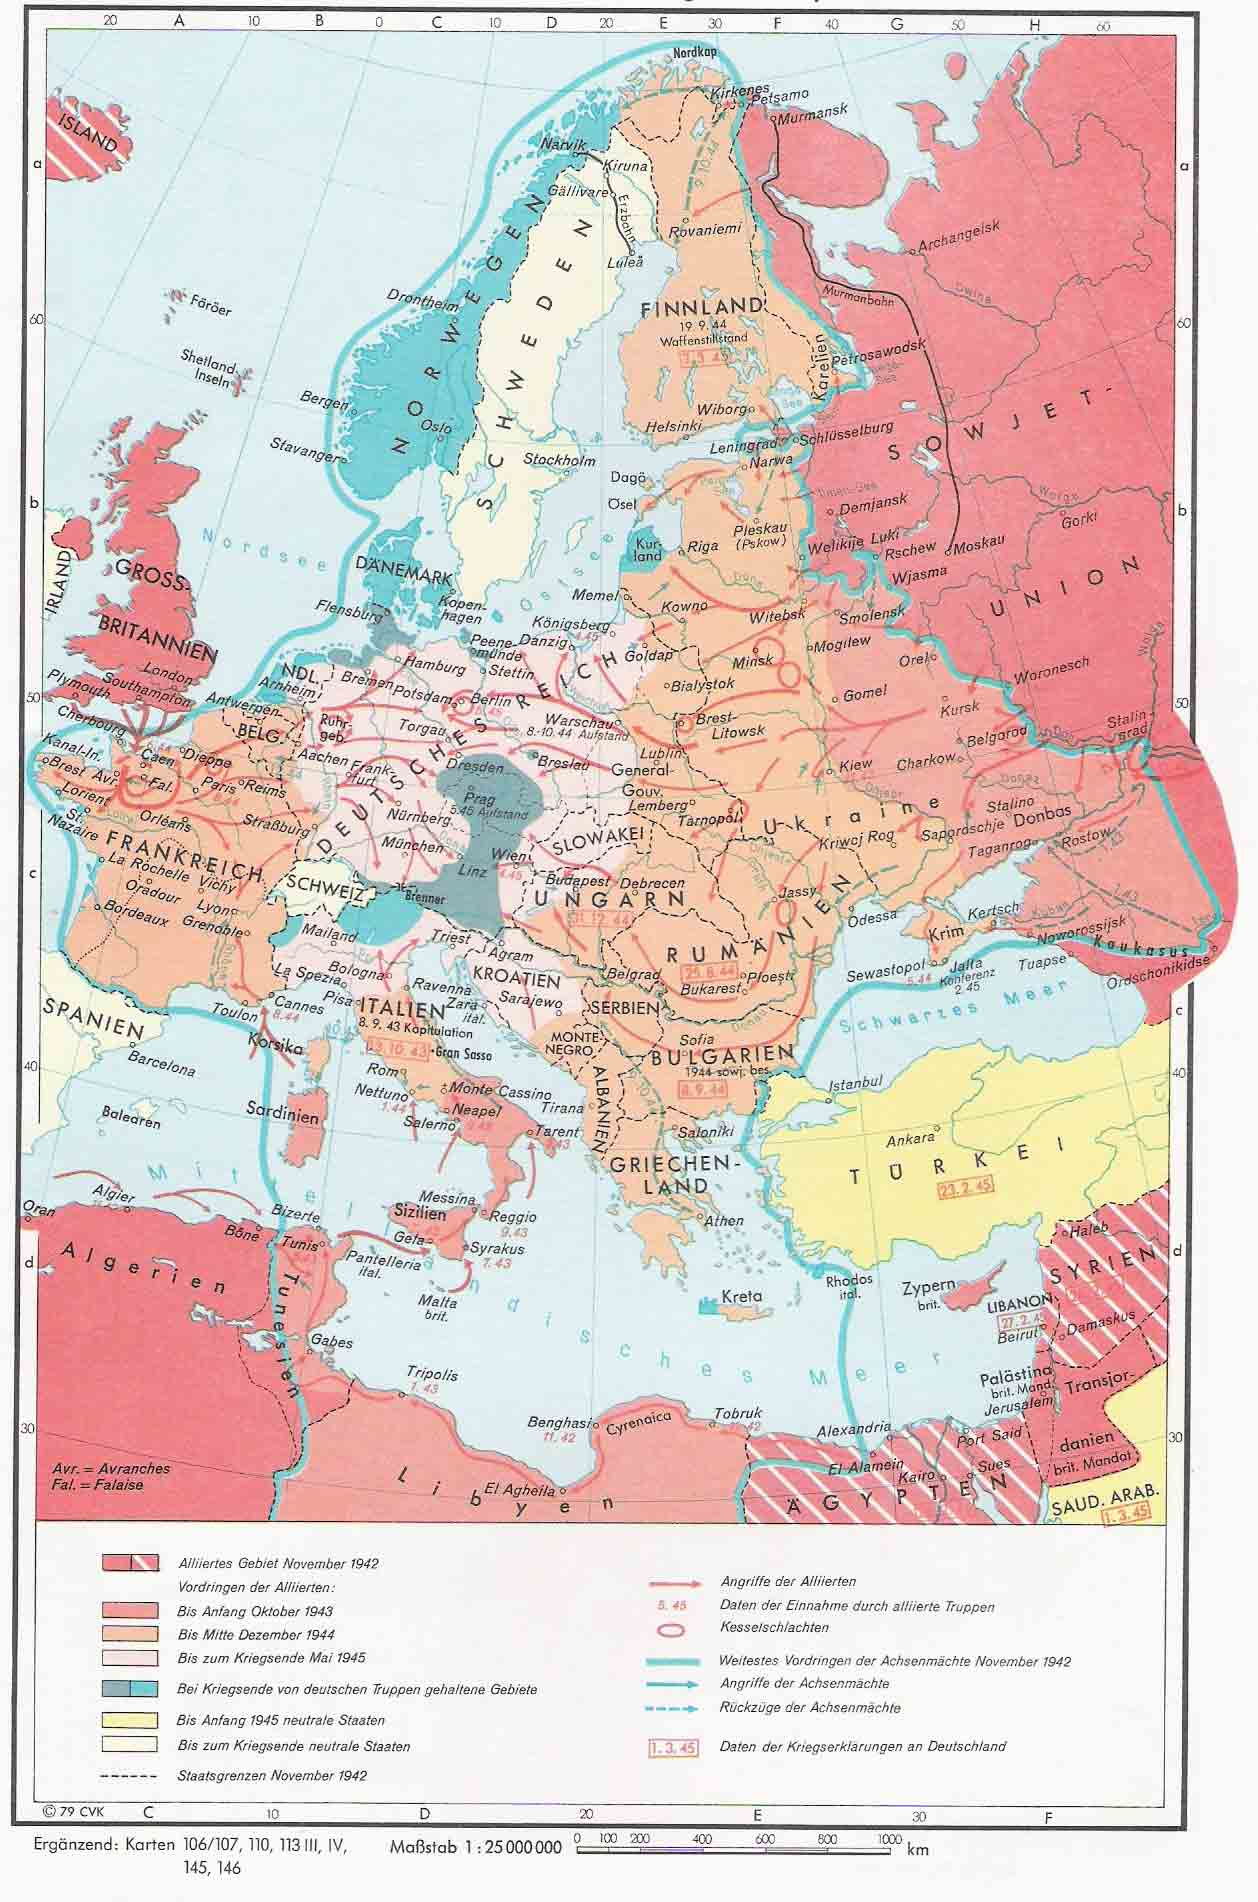 La Segunda Guerra Mundial en Europa 1942-1945